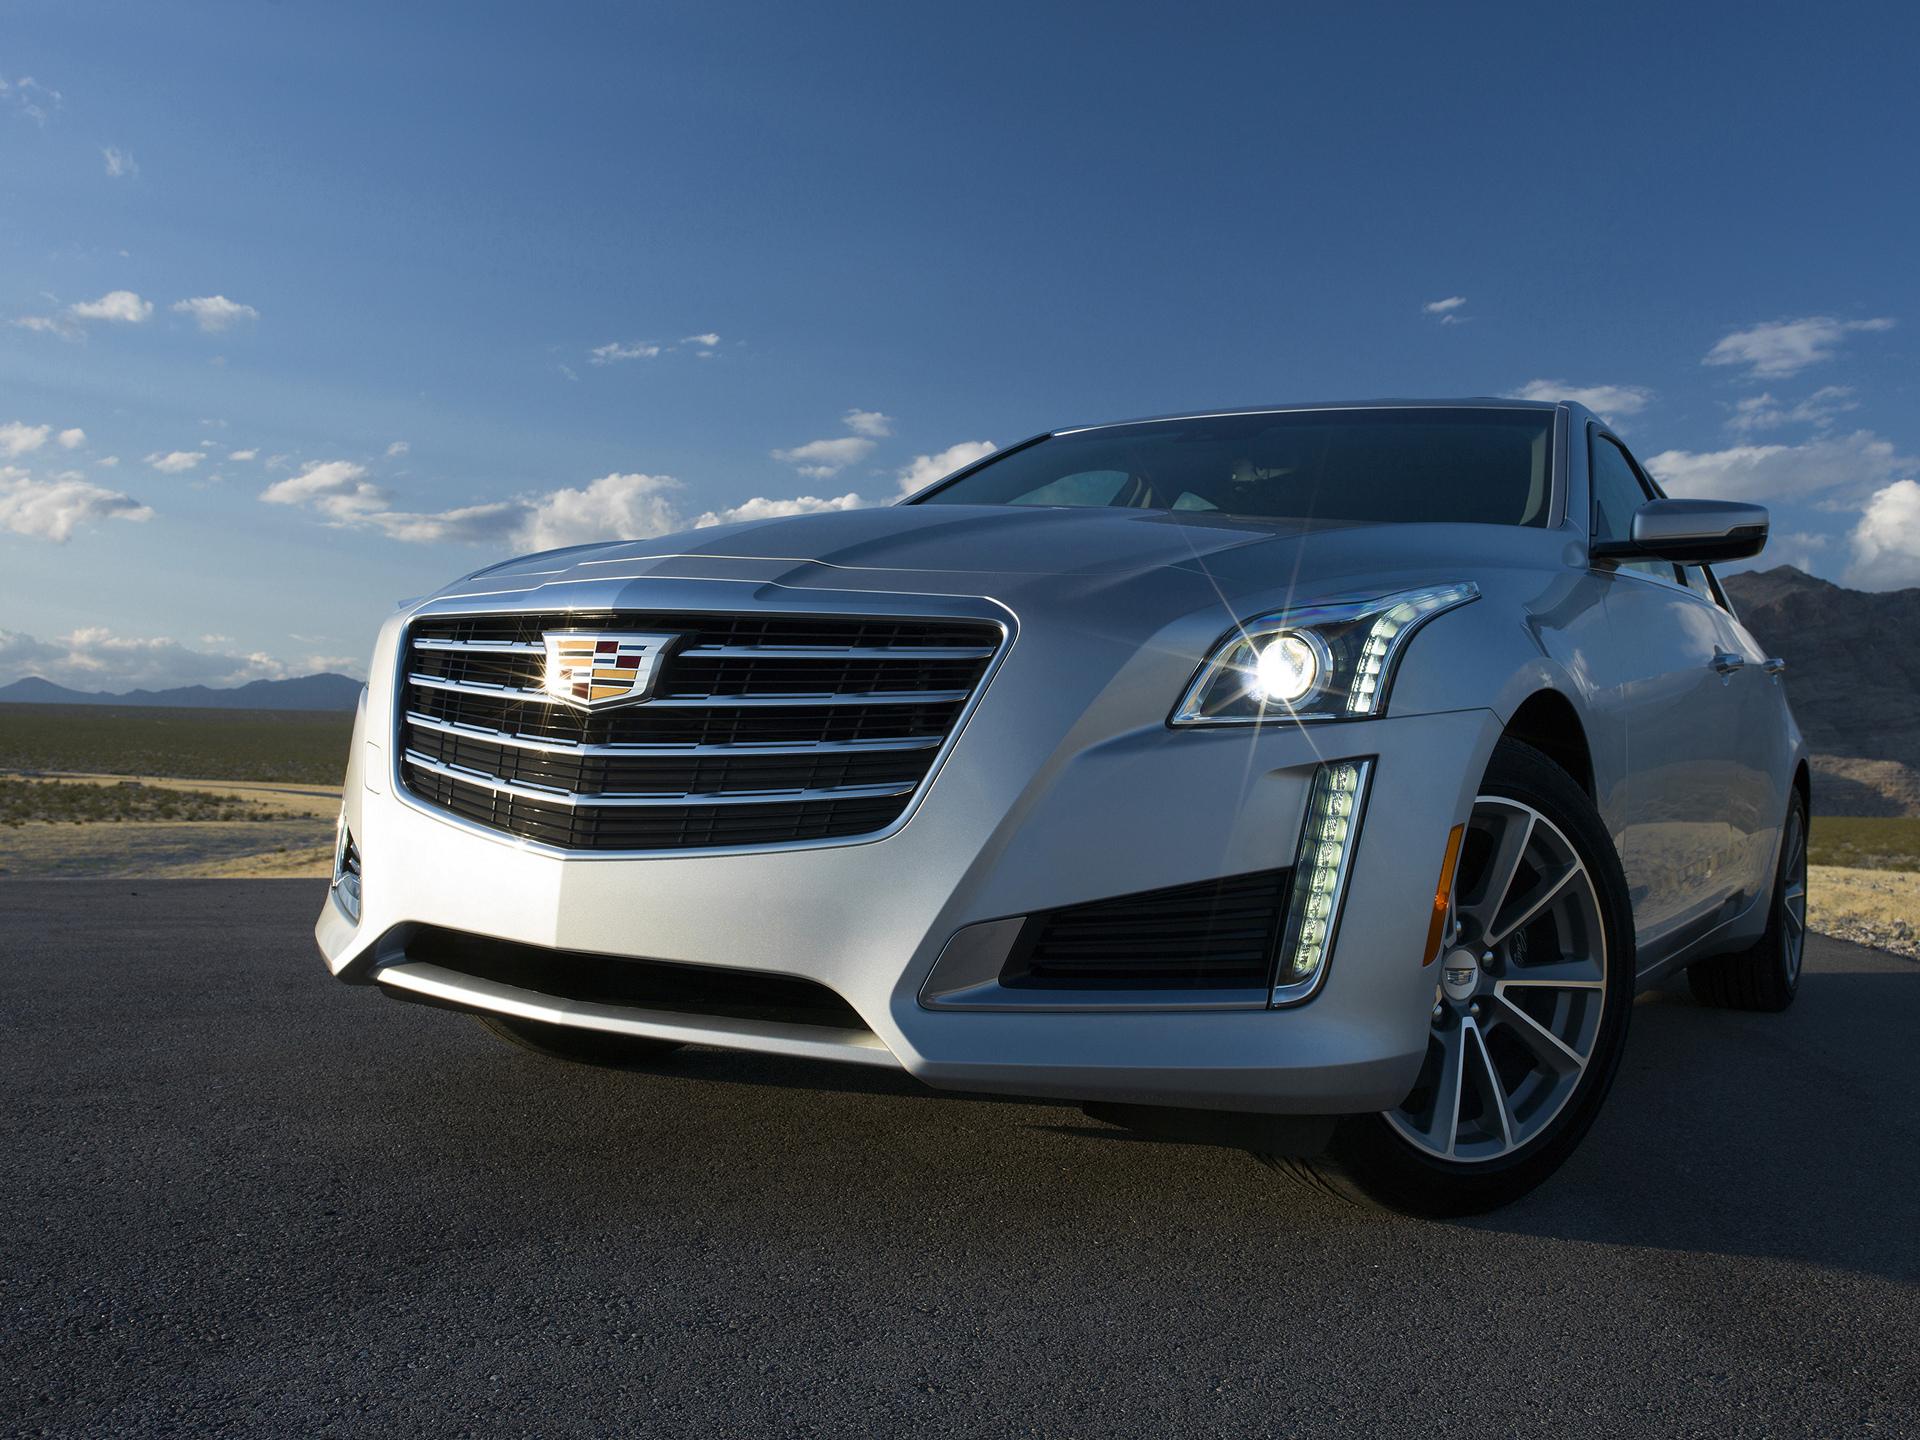 2017 Cadillac CTS © General Motors